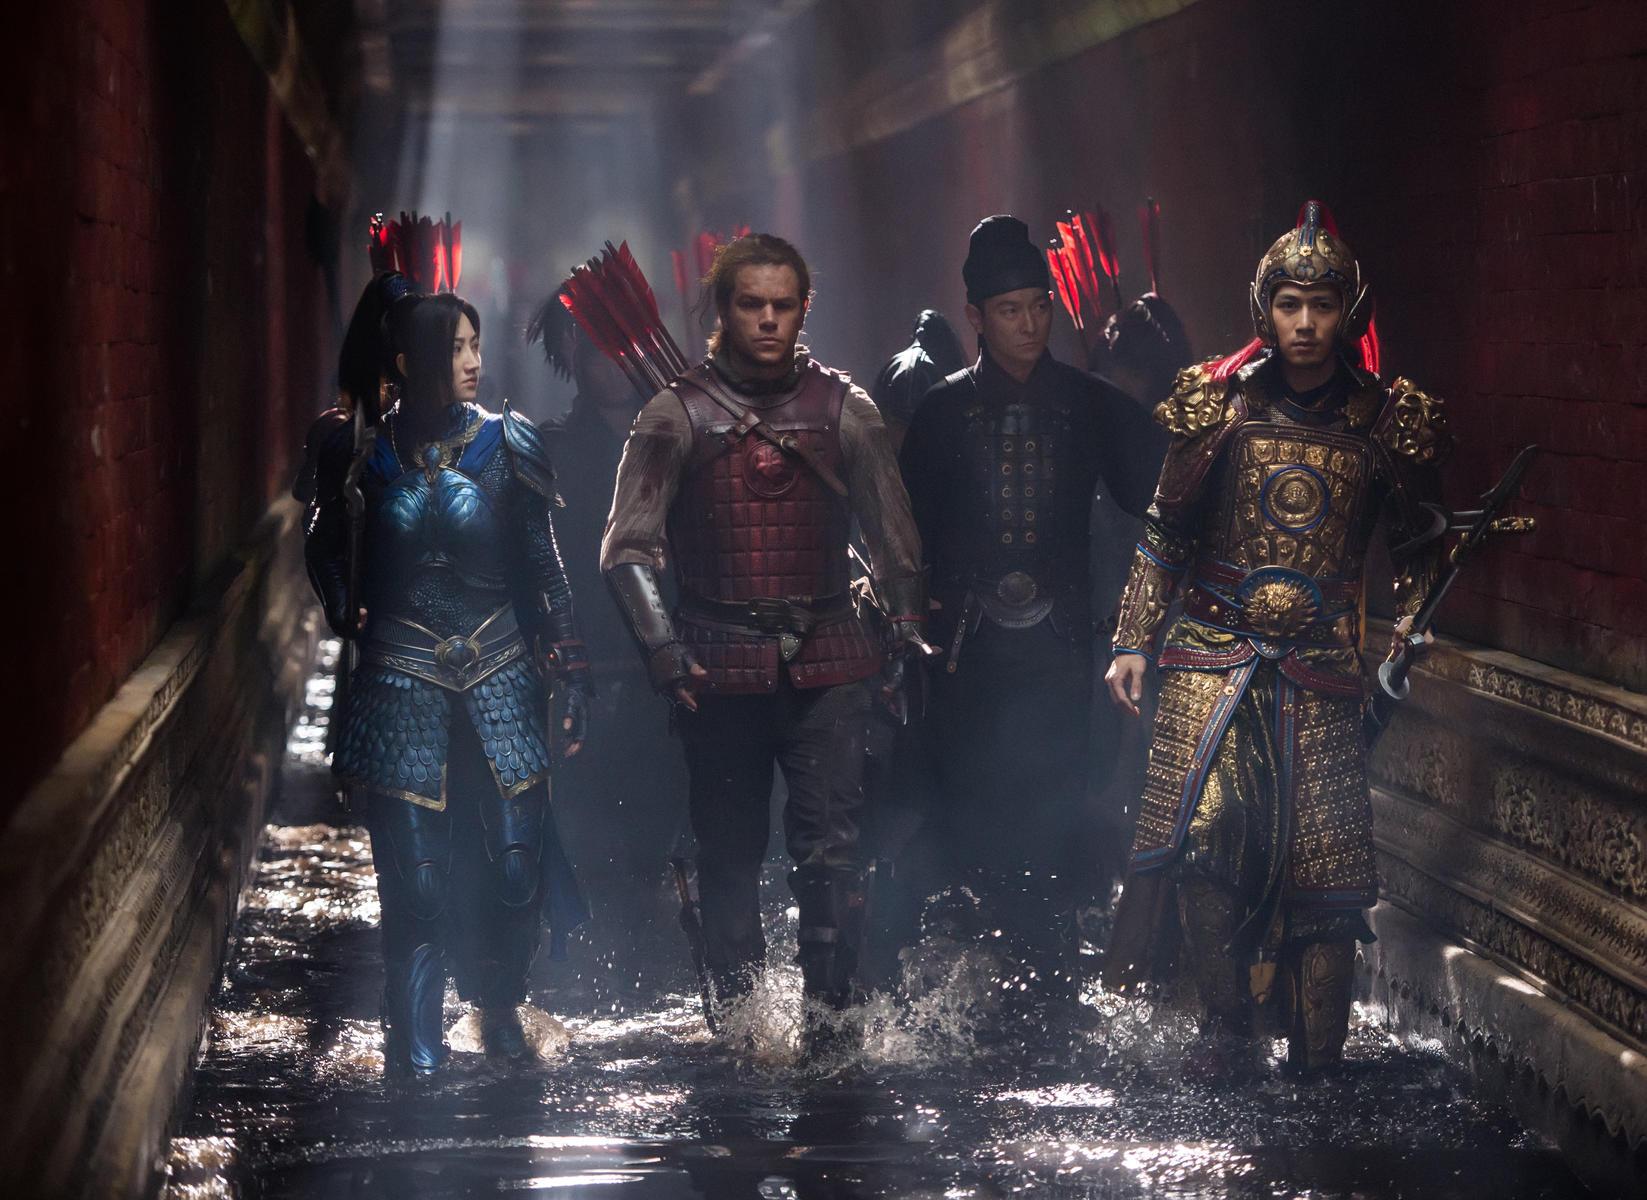 The Great Wall mit Matt Damon Andy Lau Lu Han Tian Jing